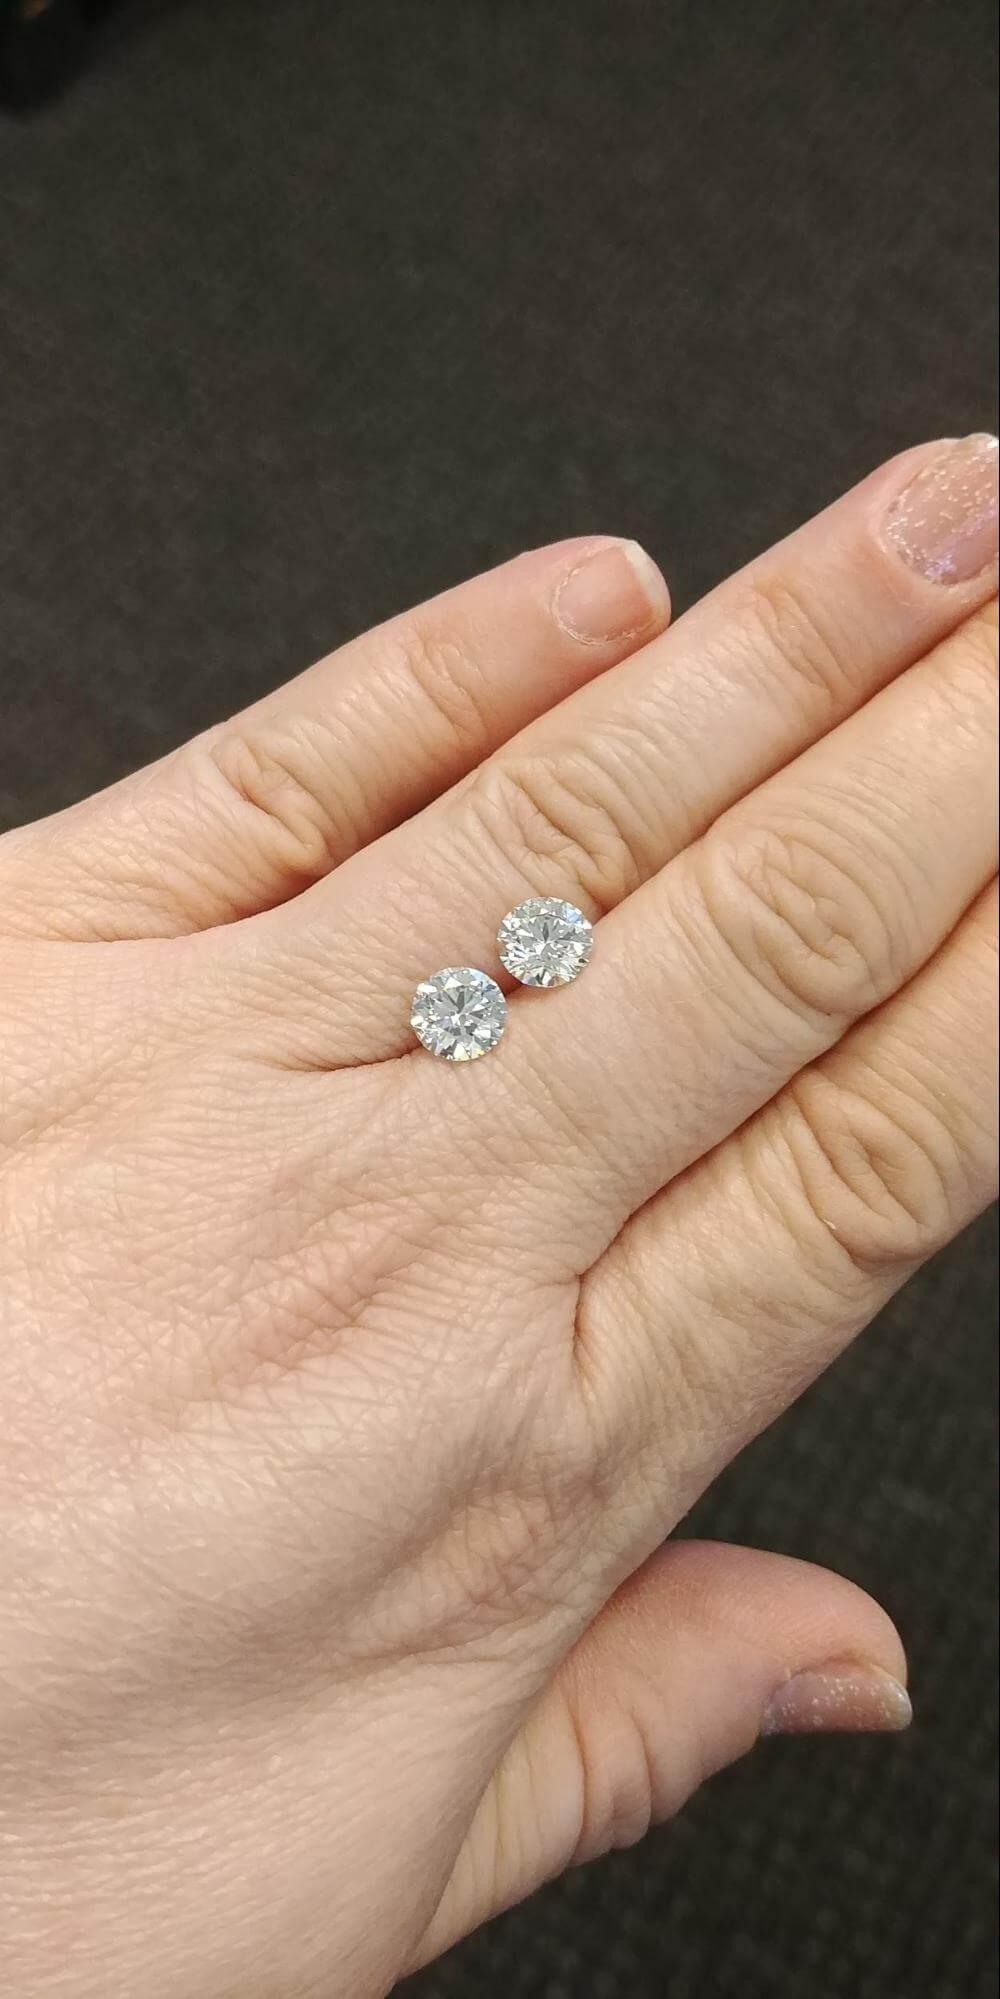 buying engagement ring online - whiteflash customer service